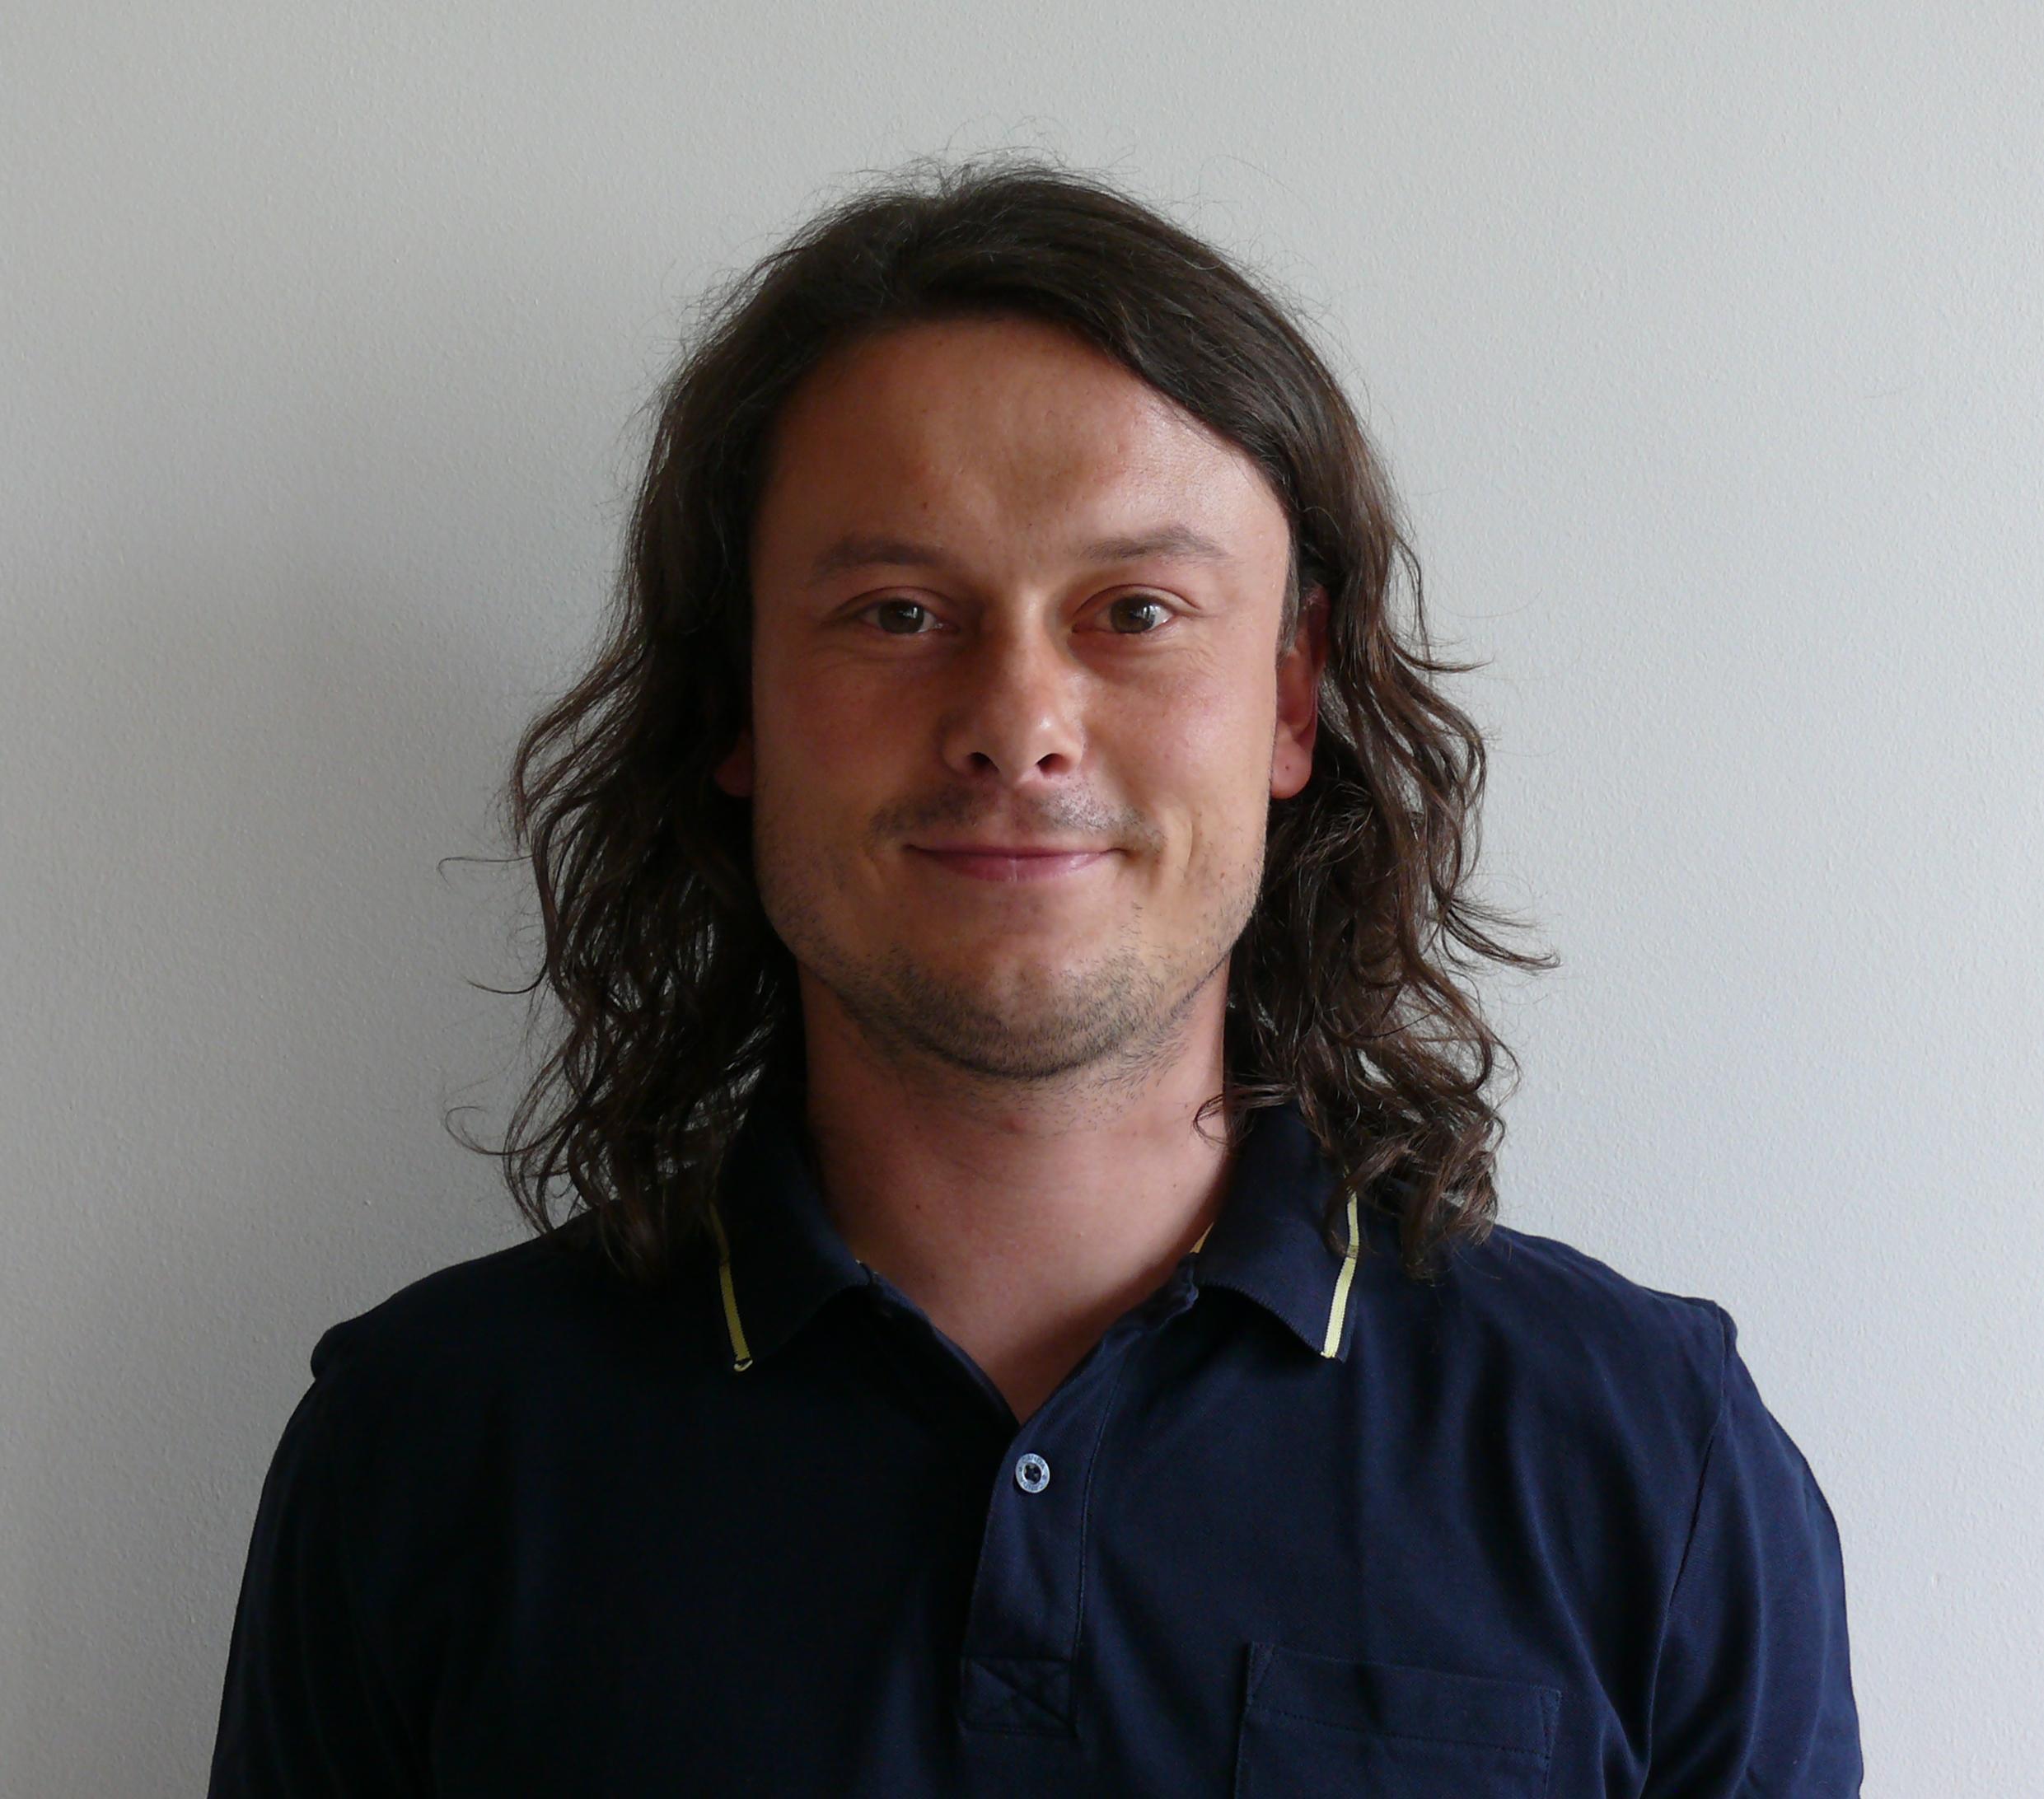 Aleksander Kosendiak